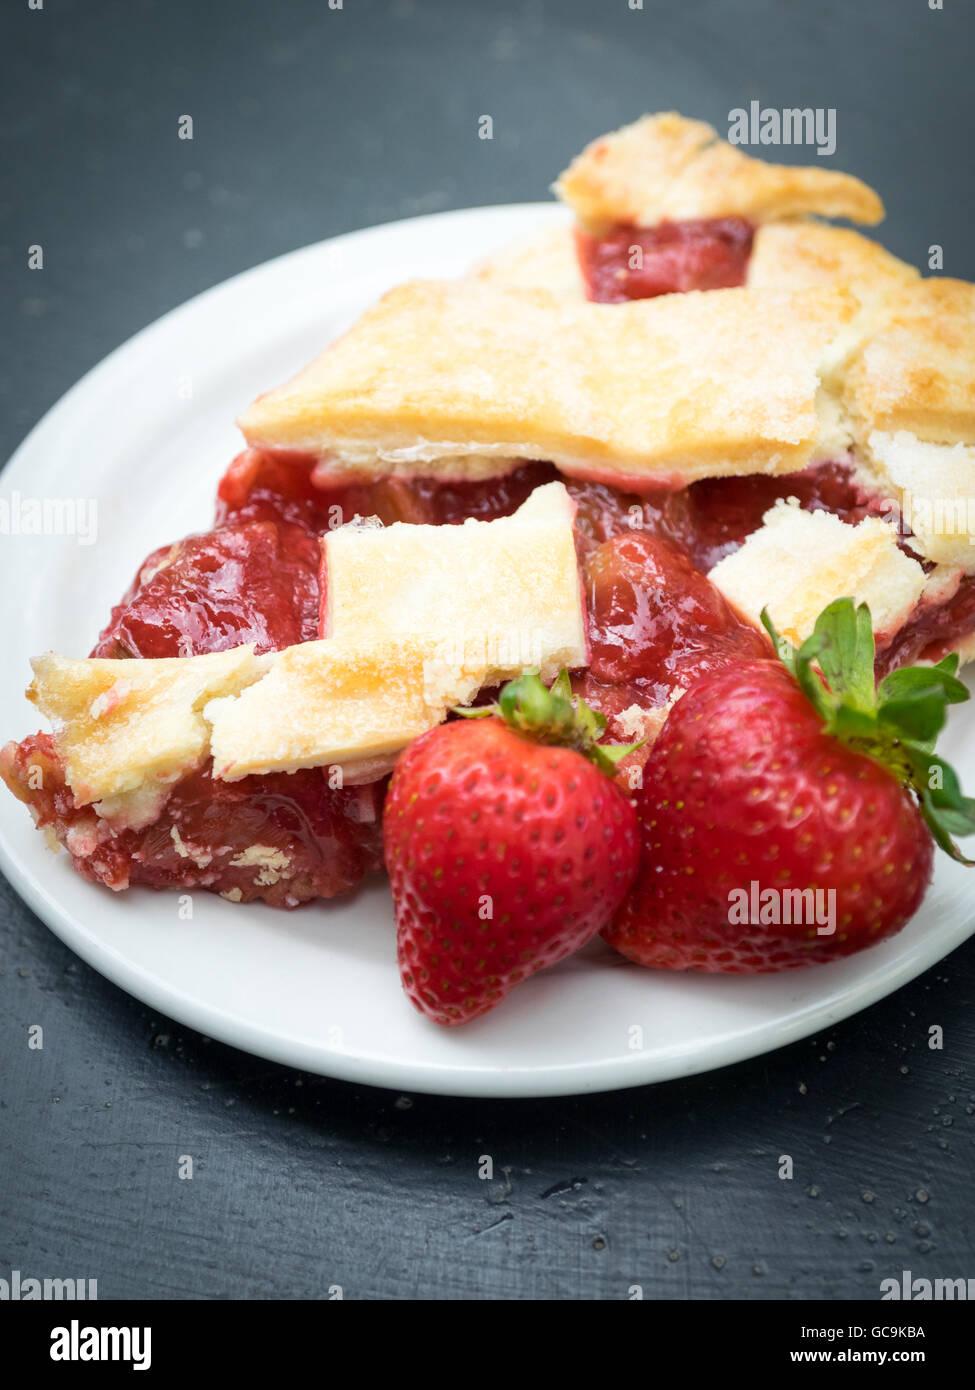 A slice of strawberry-rhubarb pie from Zuppa Café in Edmonton, Alberta, Canada. - Stock Image